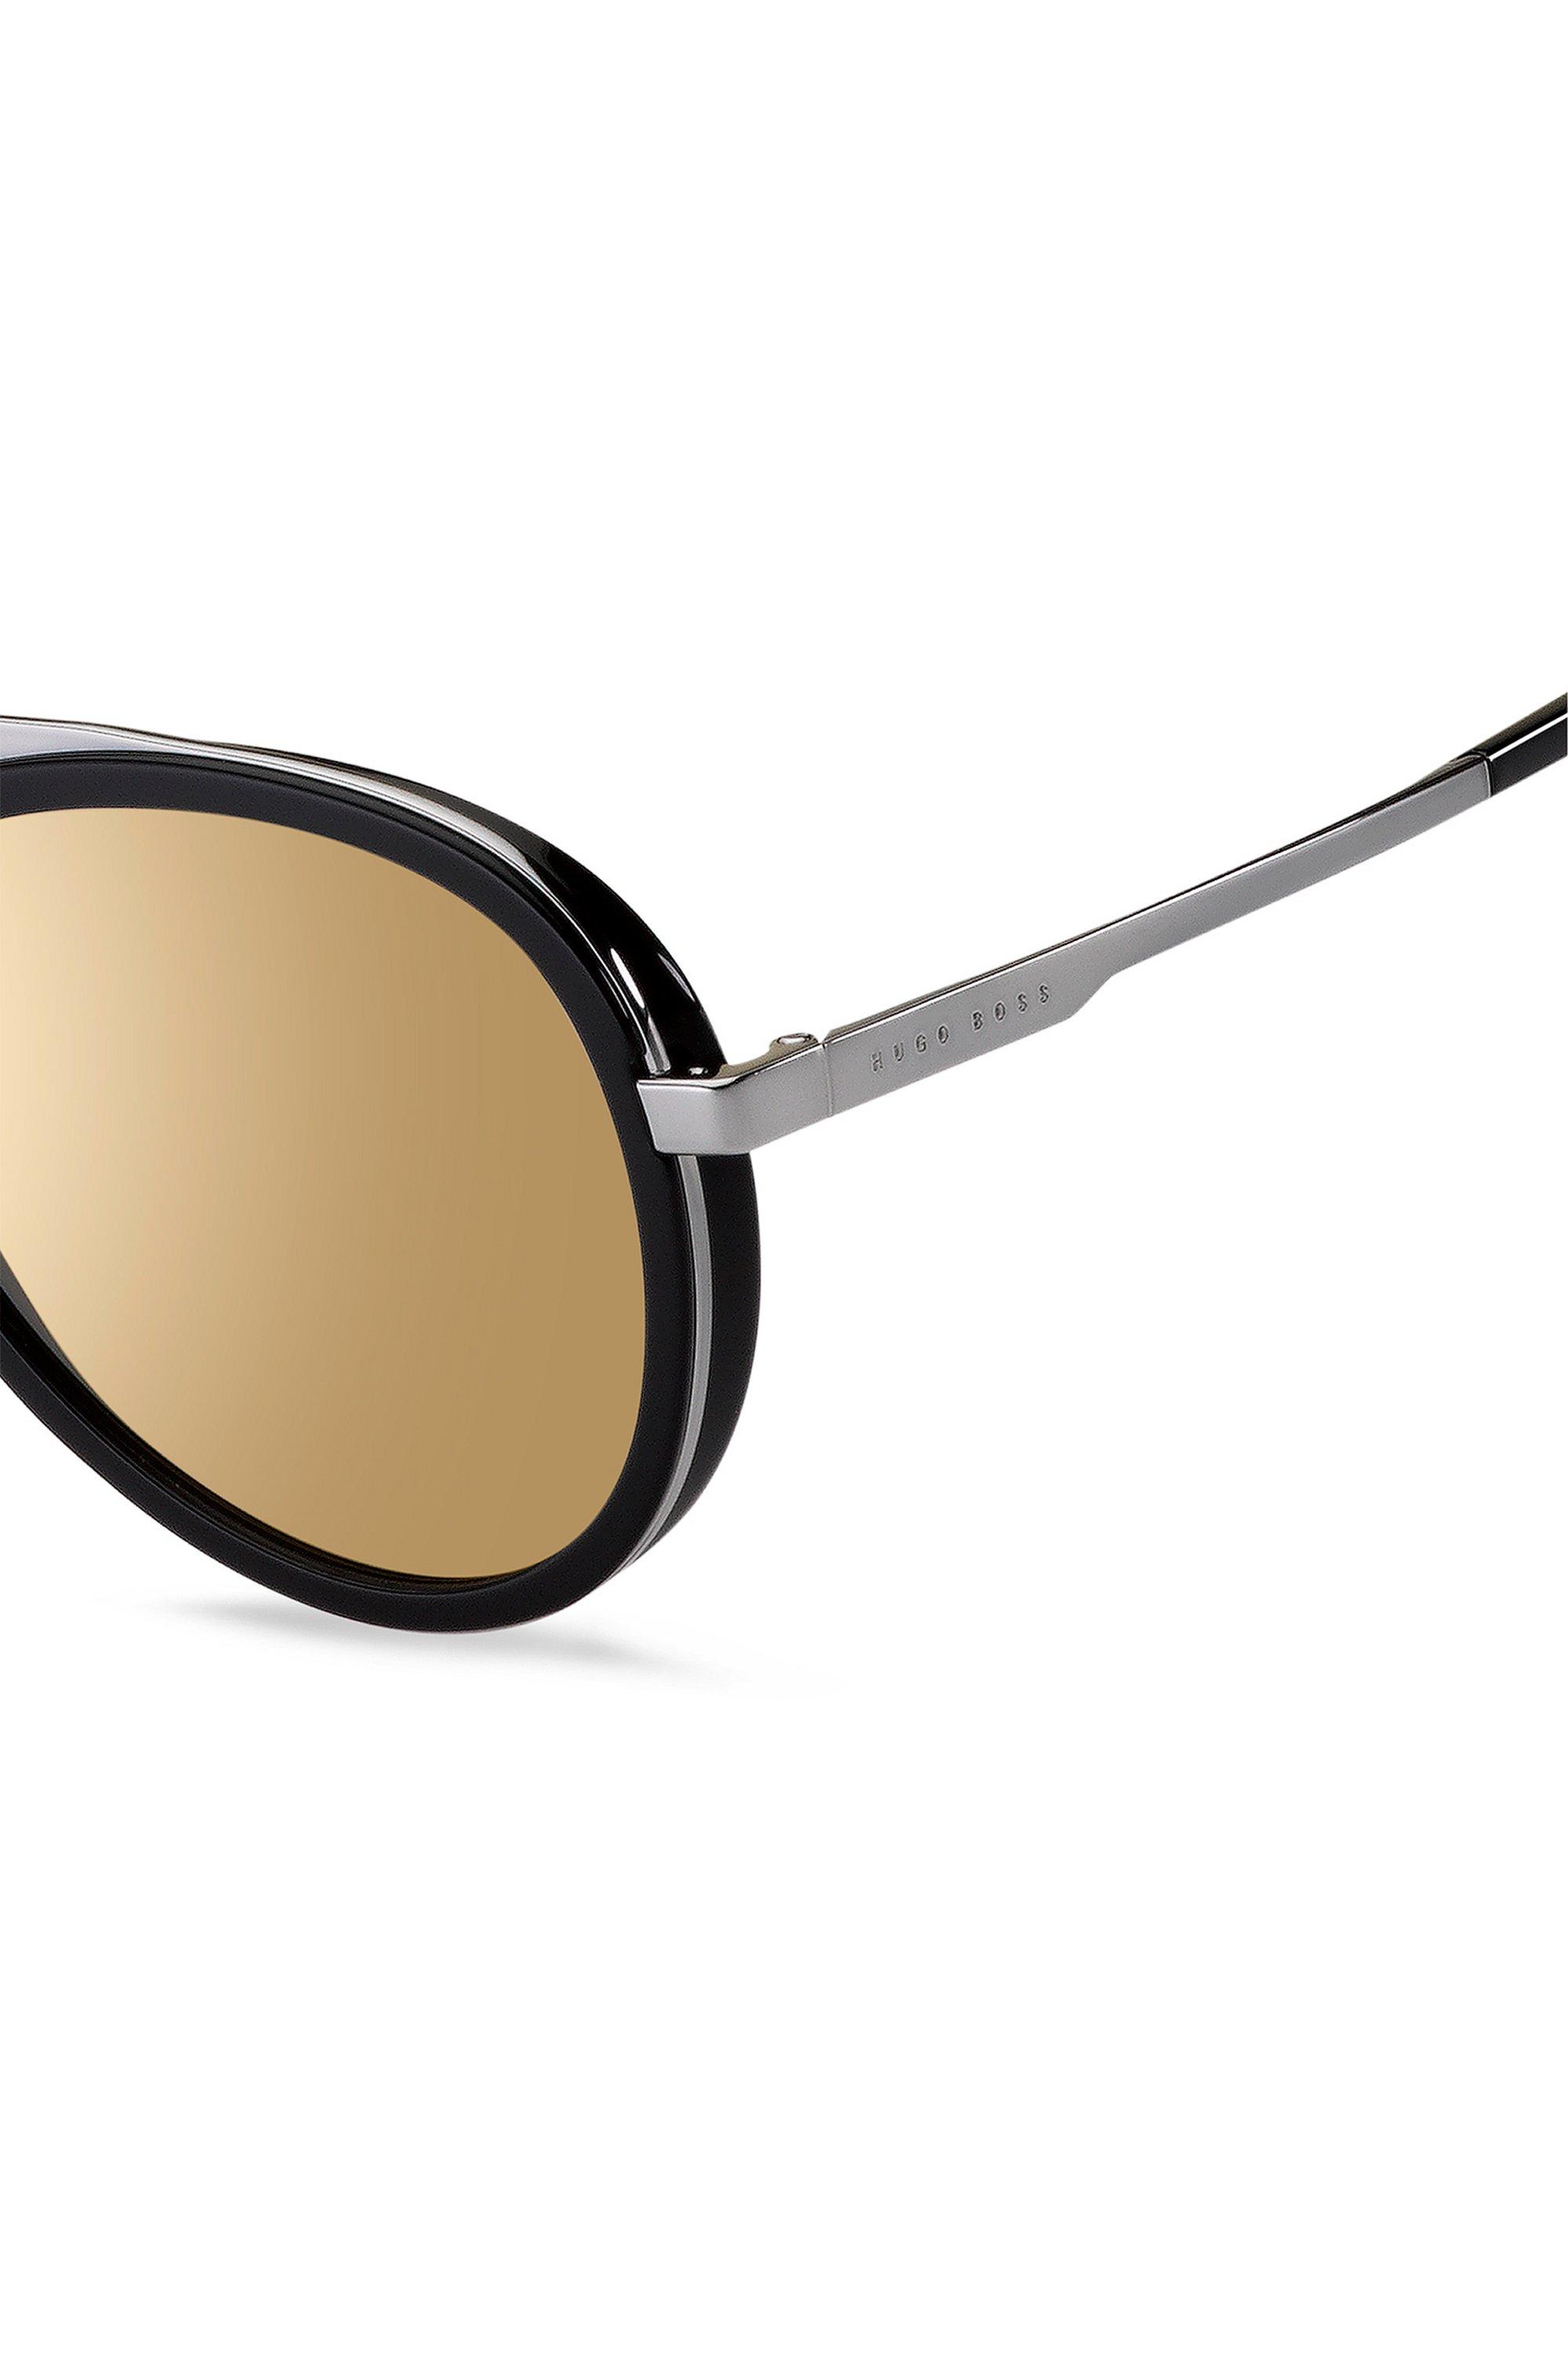 Triple-bridge sunglasses with black and silver-tone frames